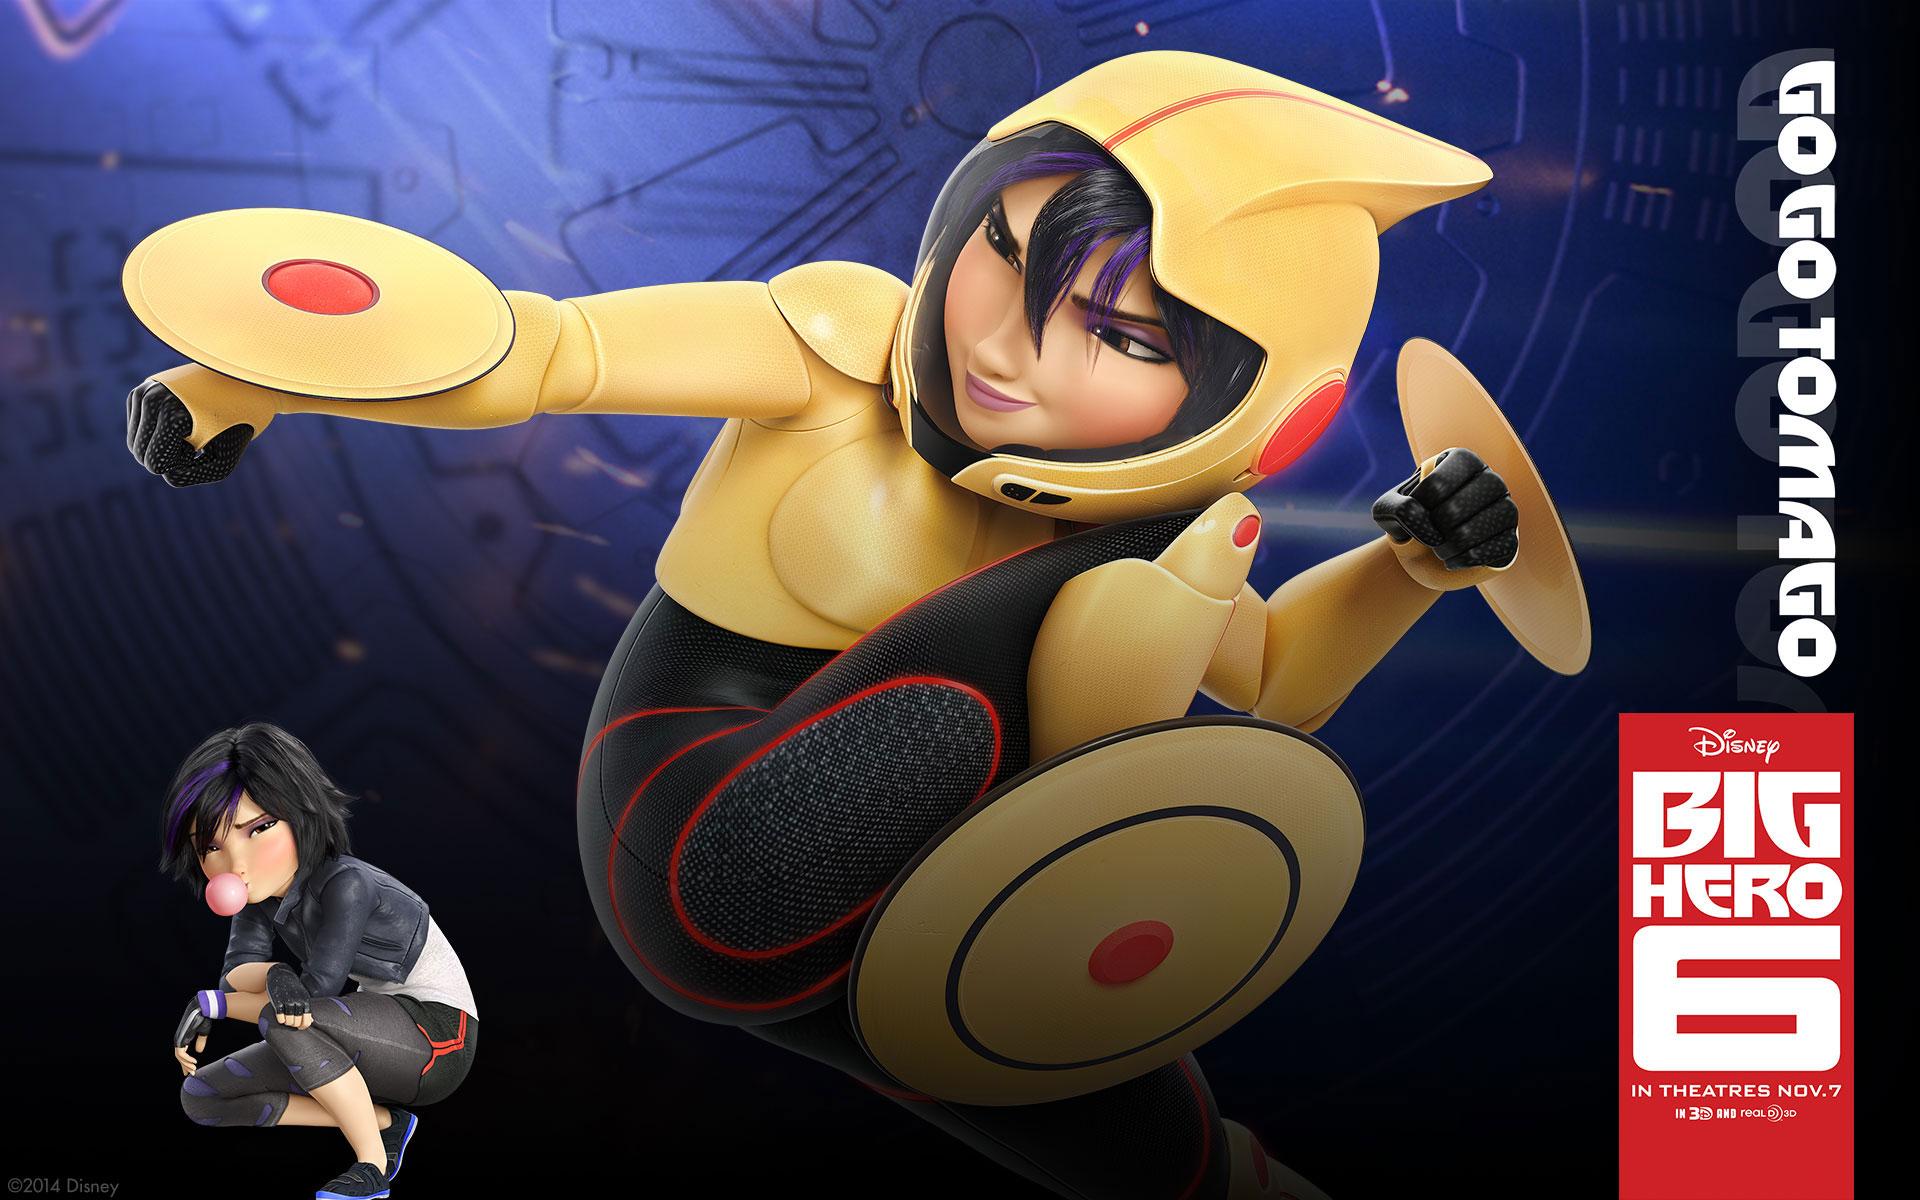 Disney Movie Big Hero 6 (2014) Desktop & iPhone Wallpapers HD